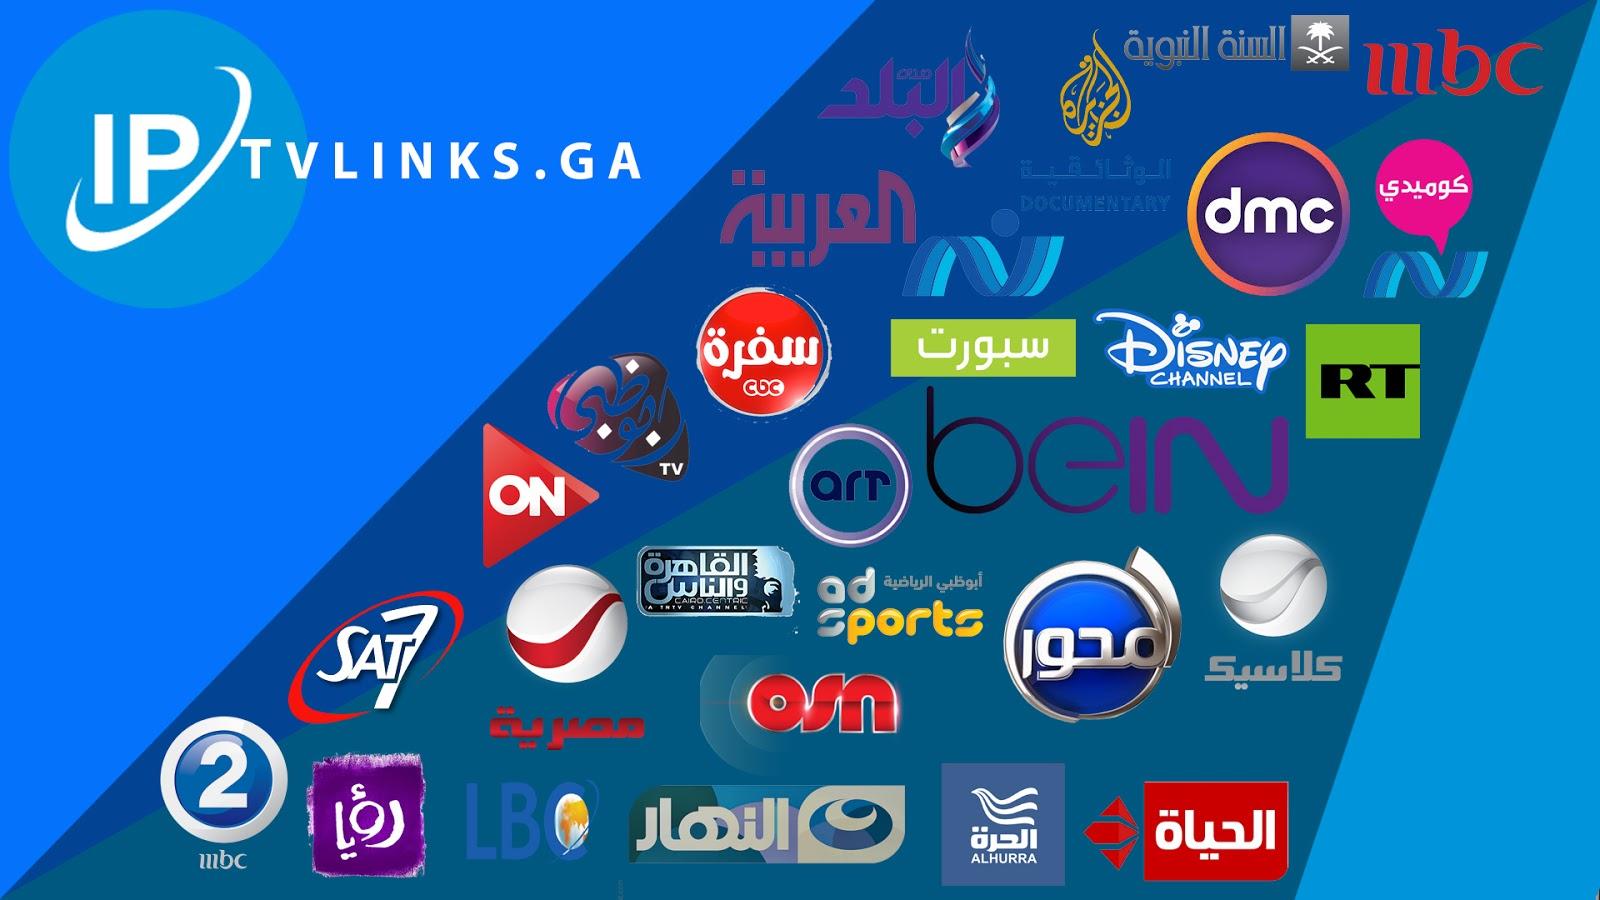 IPTV Links Free - IPTV Playlist For FREE, Watch Live Tv